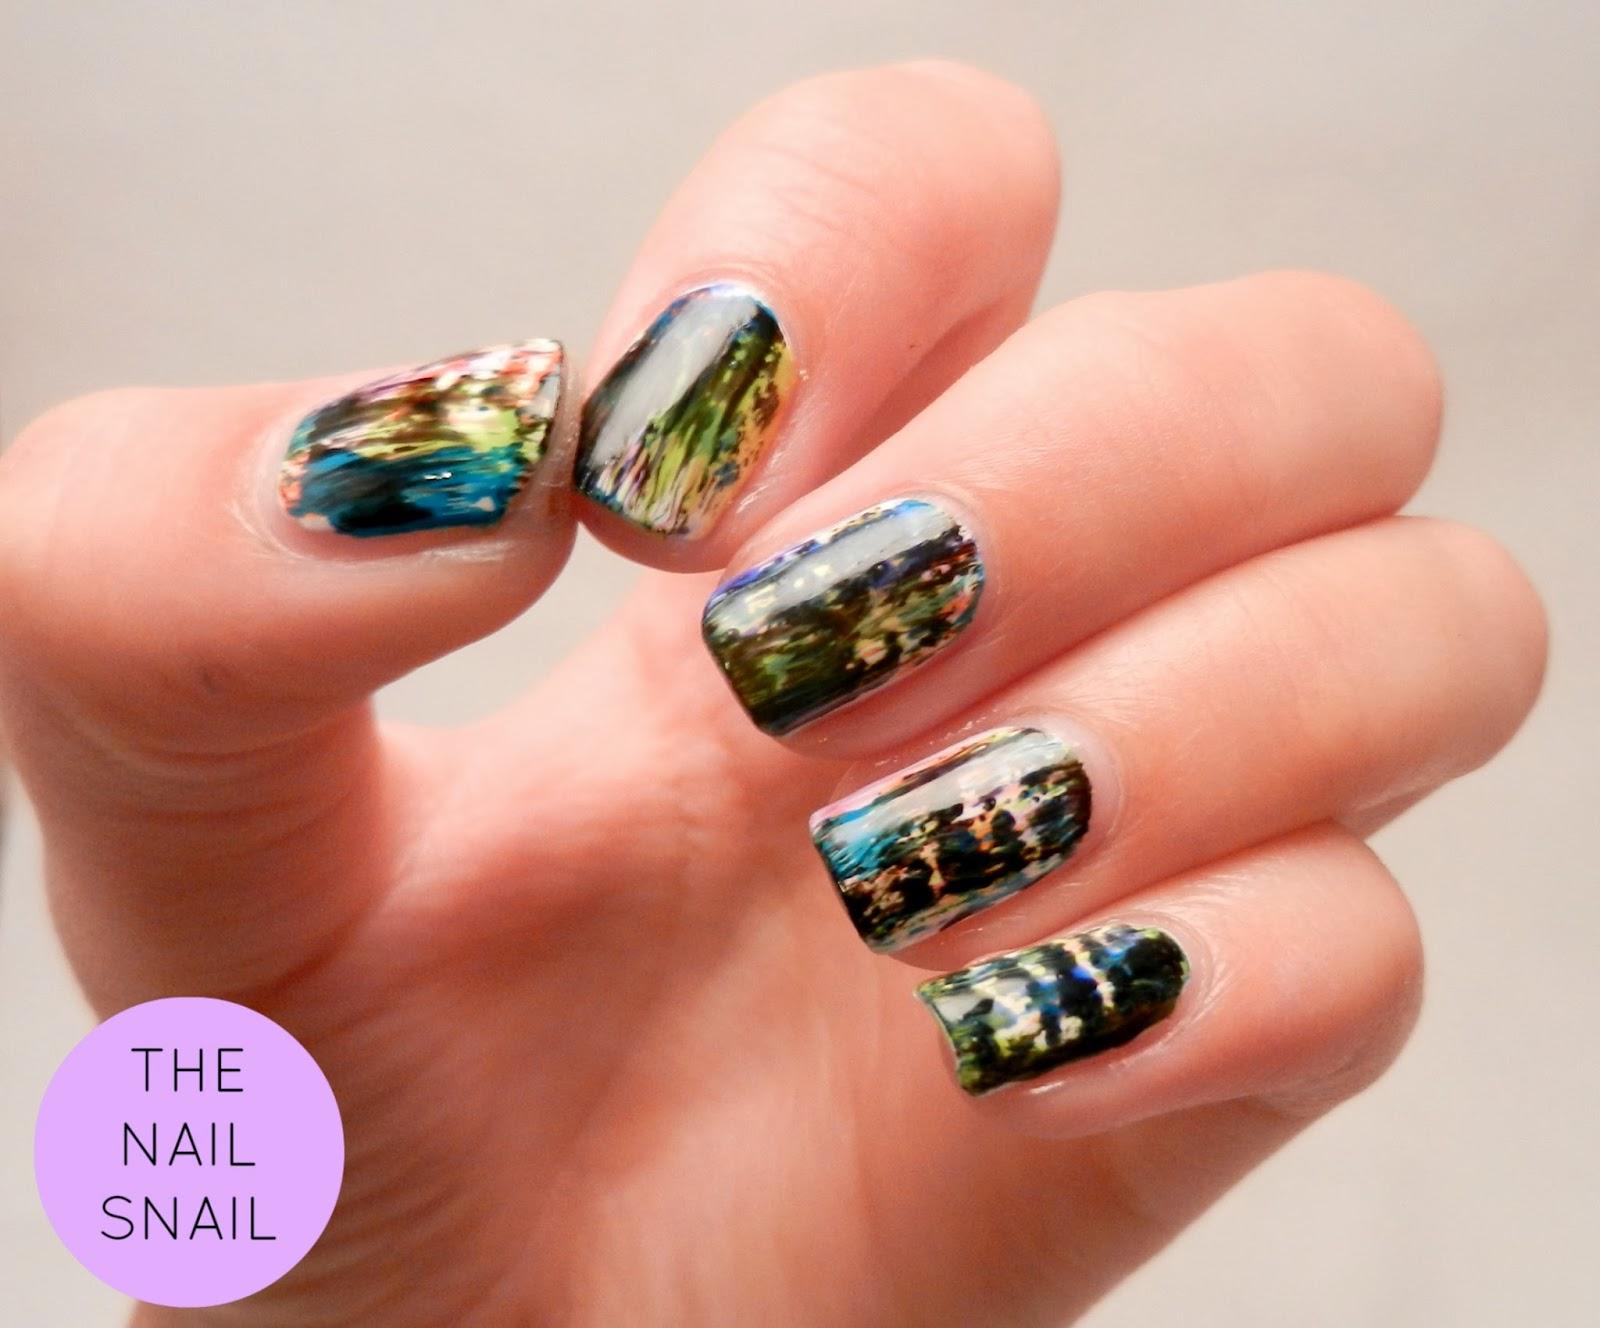 The Nail Snail Grunge Nail Fail